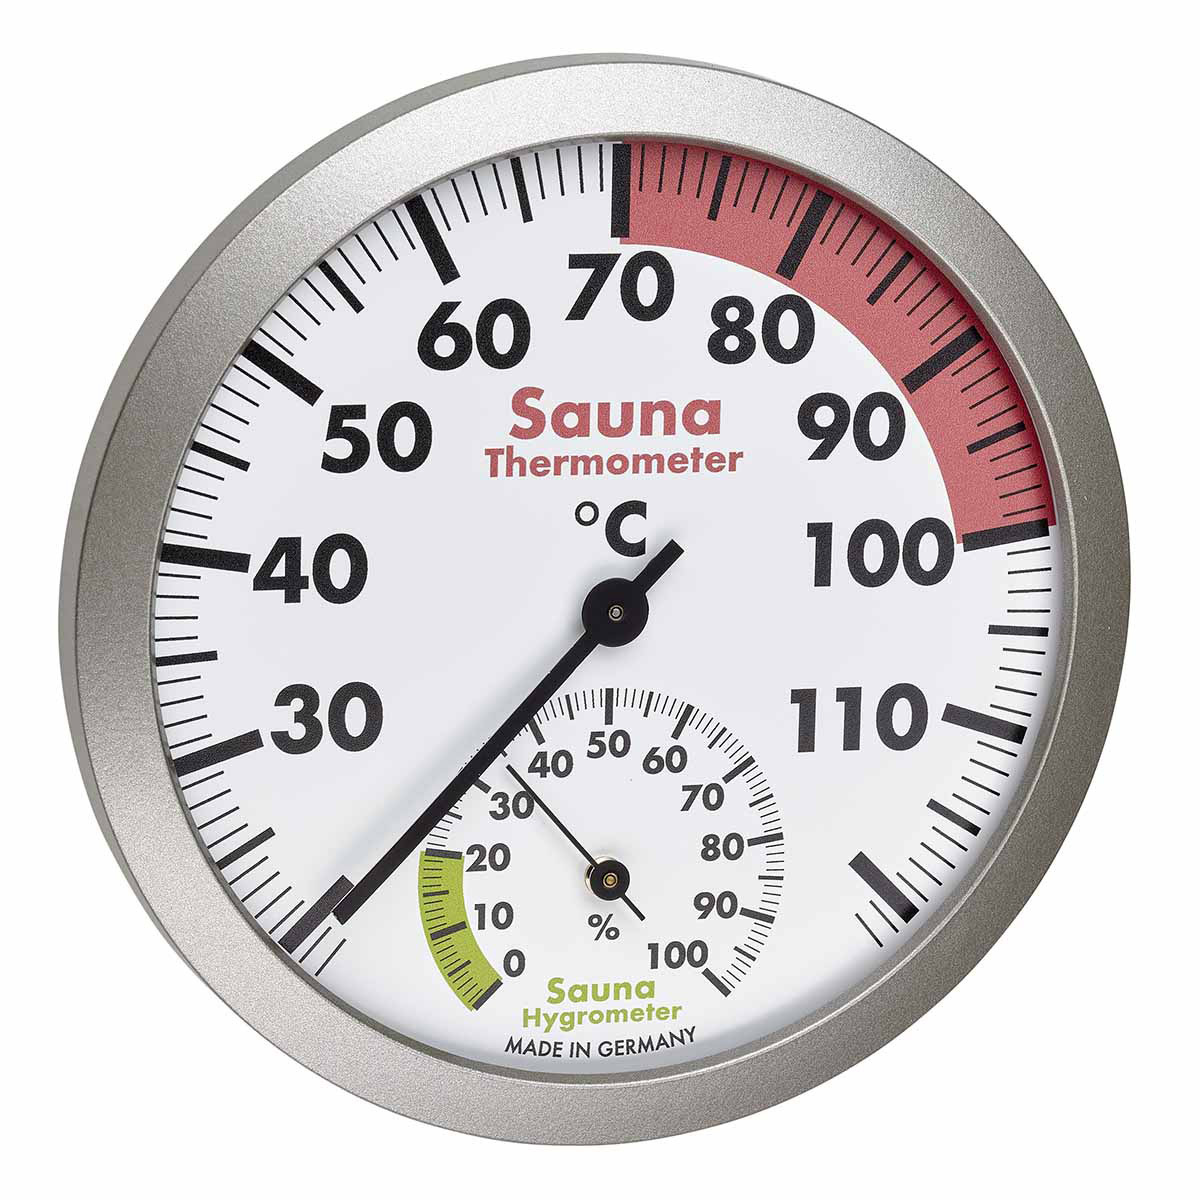 40-1055-50-analoges-sauna-thermo-hygrometer-1200x1200px.jpg